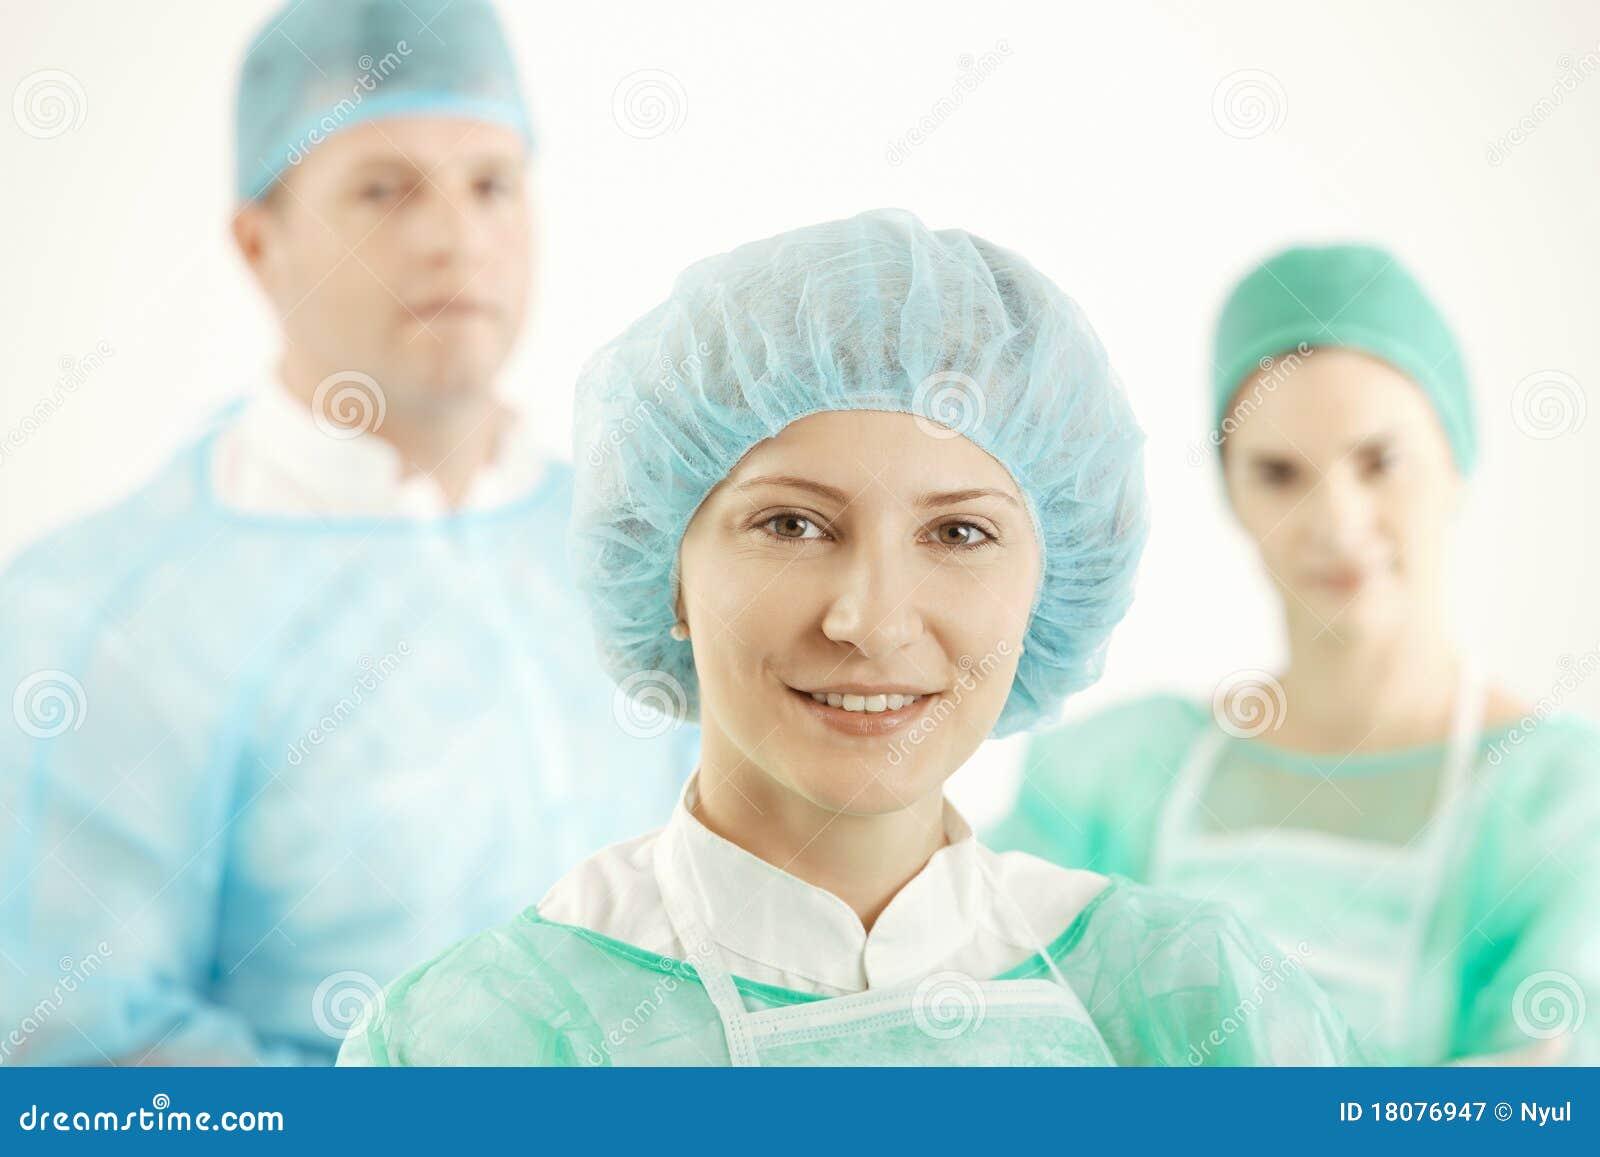 Medical team in uniform